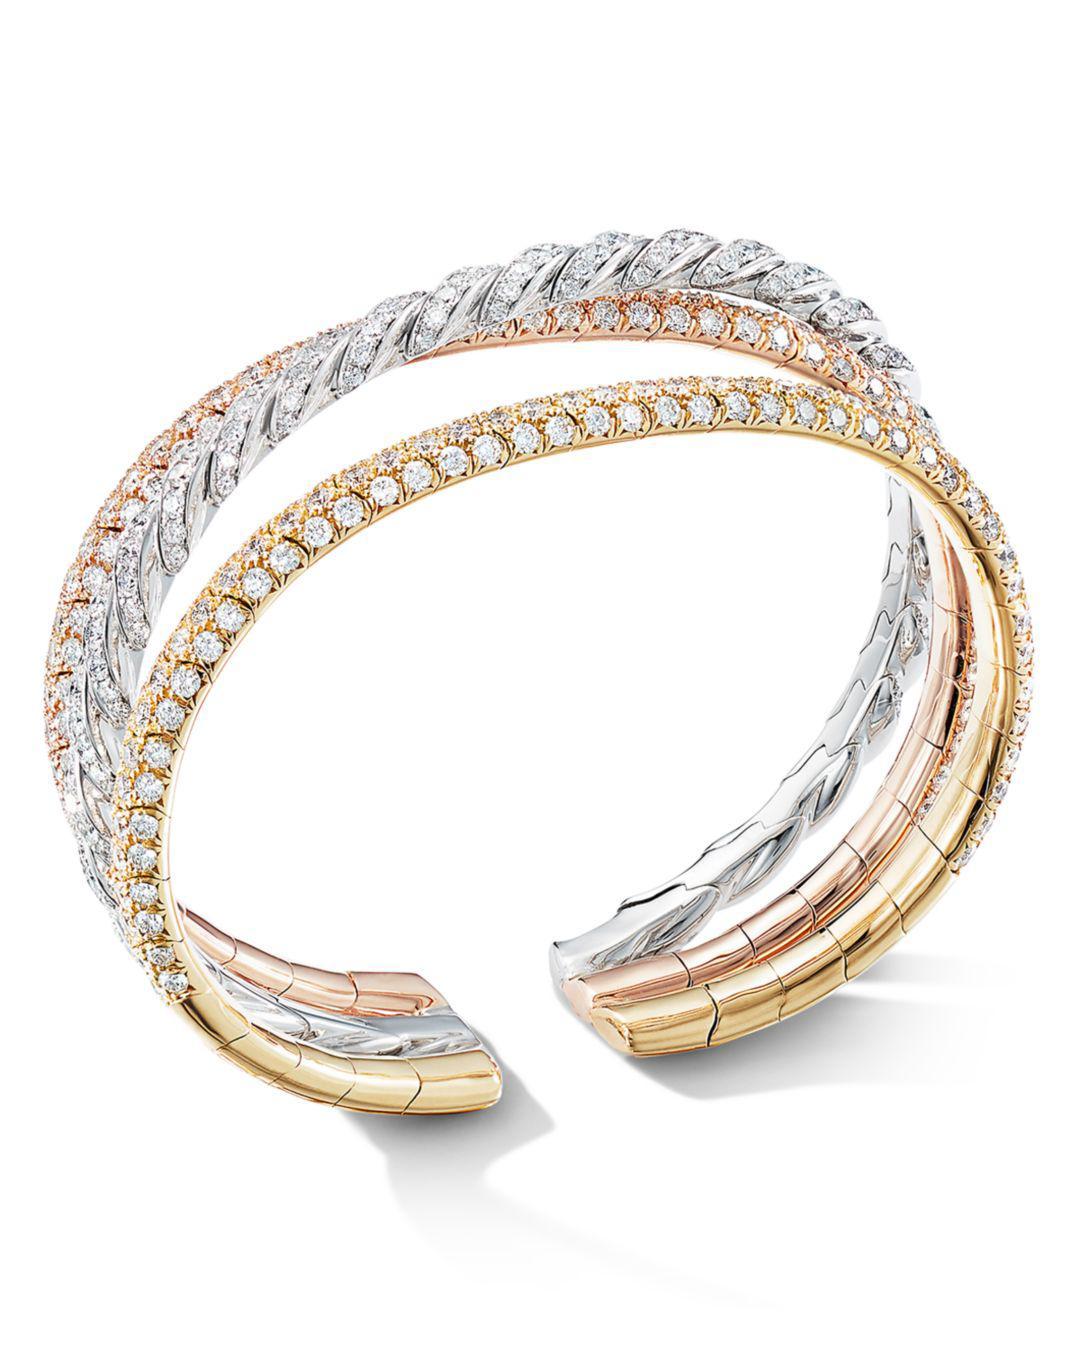 7de9d20a7e1d3 David Yurman. Women s Metallic Paveflex Three-row Bracelet In 18k Gold With  Diamonds